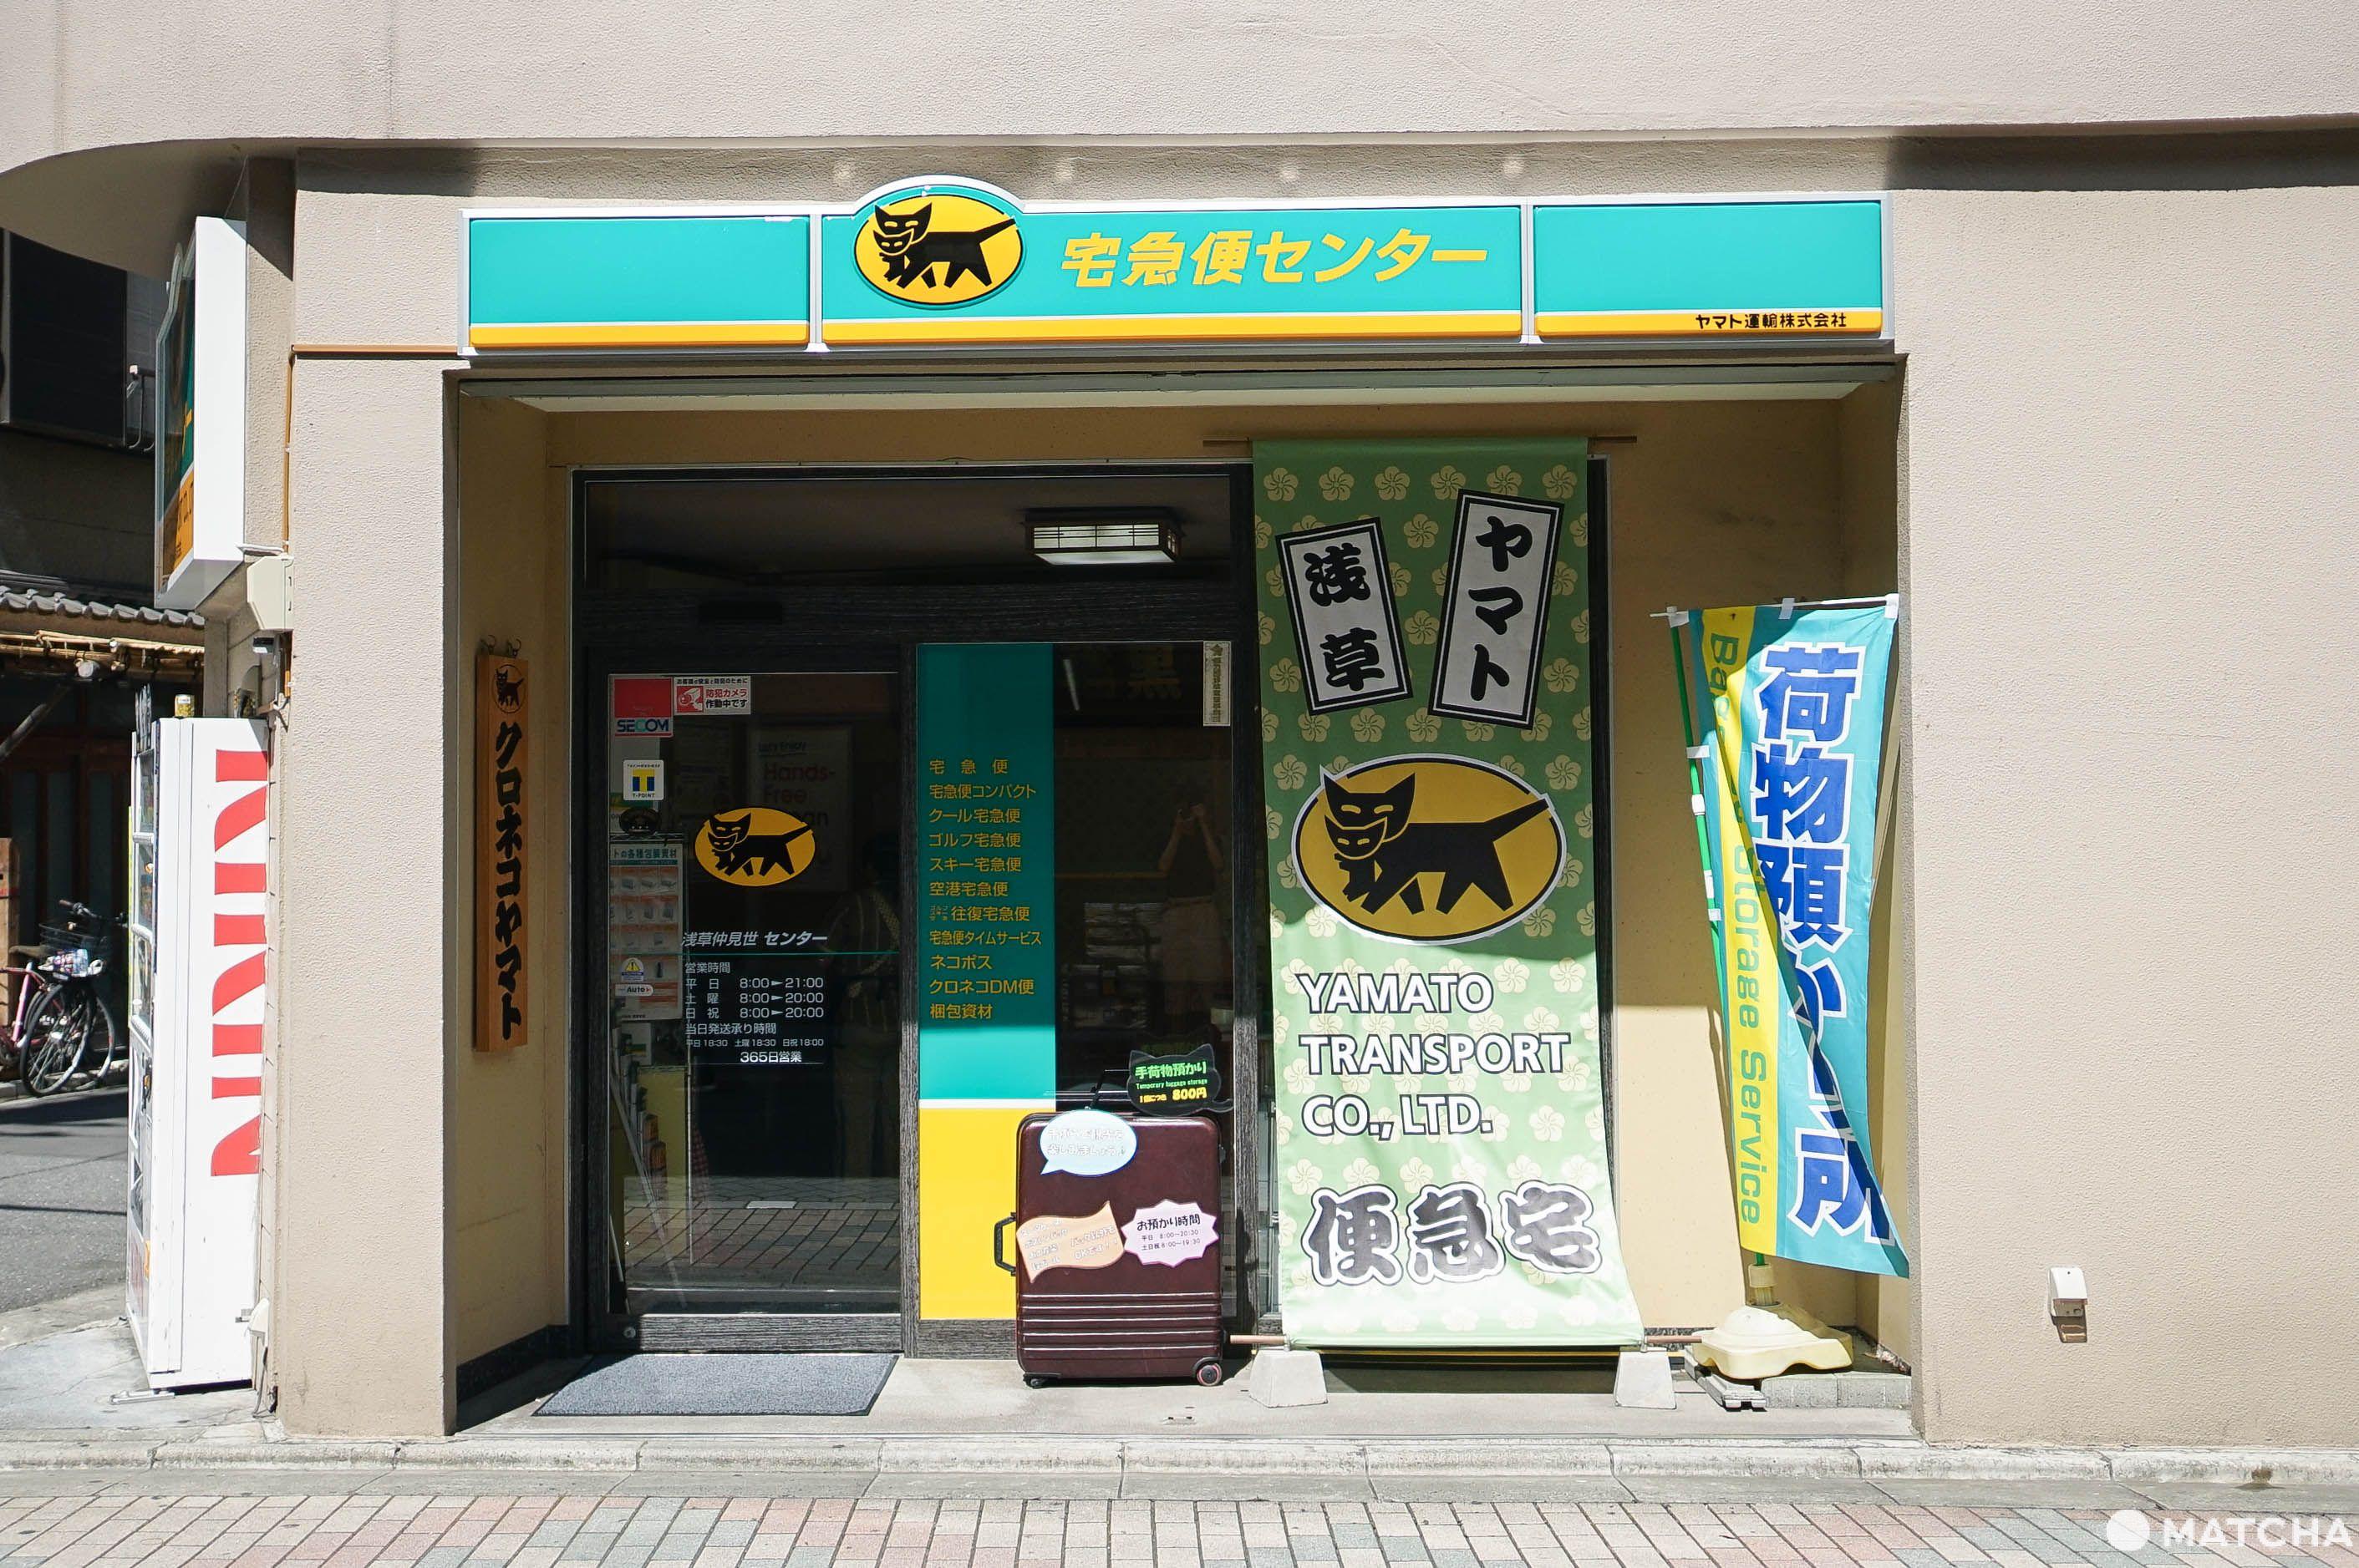 Hands-Free Travel Center in Asakusa